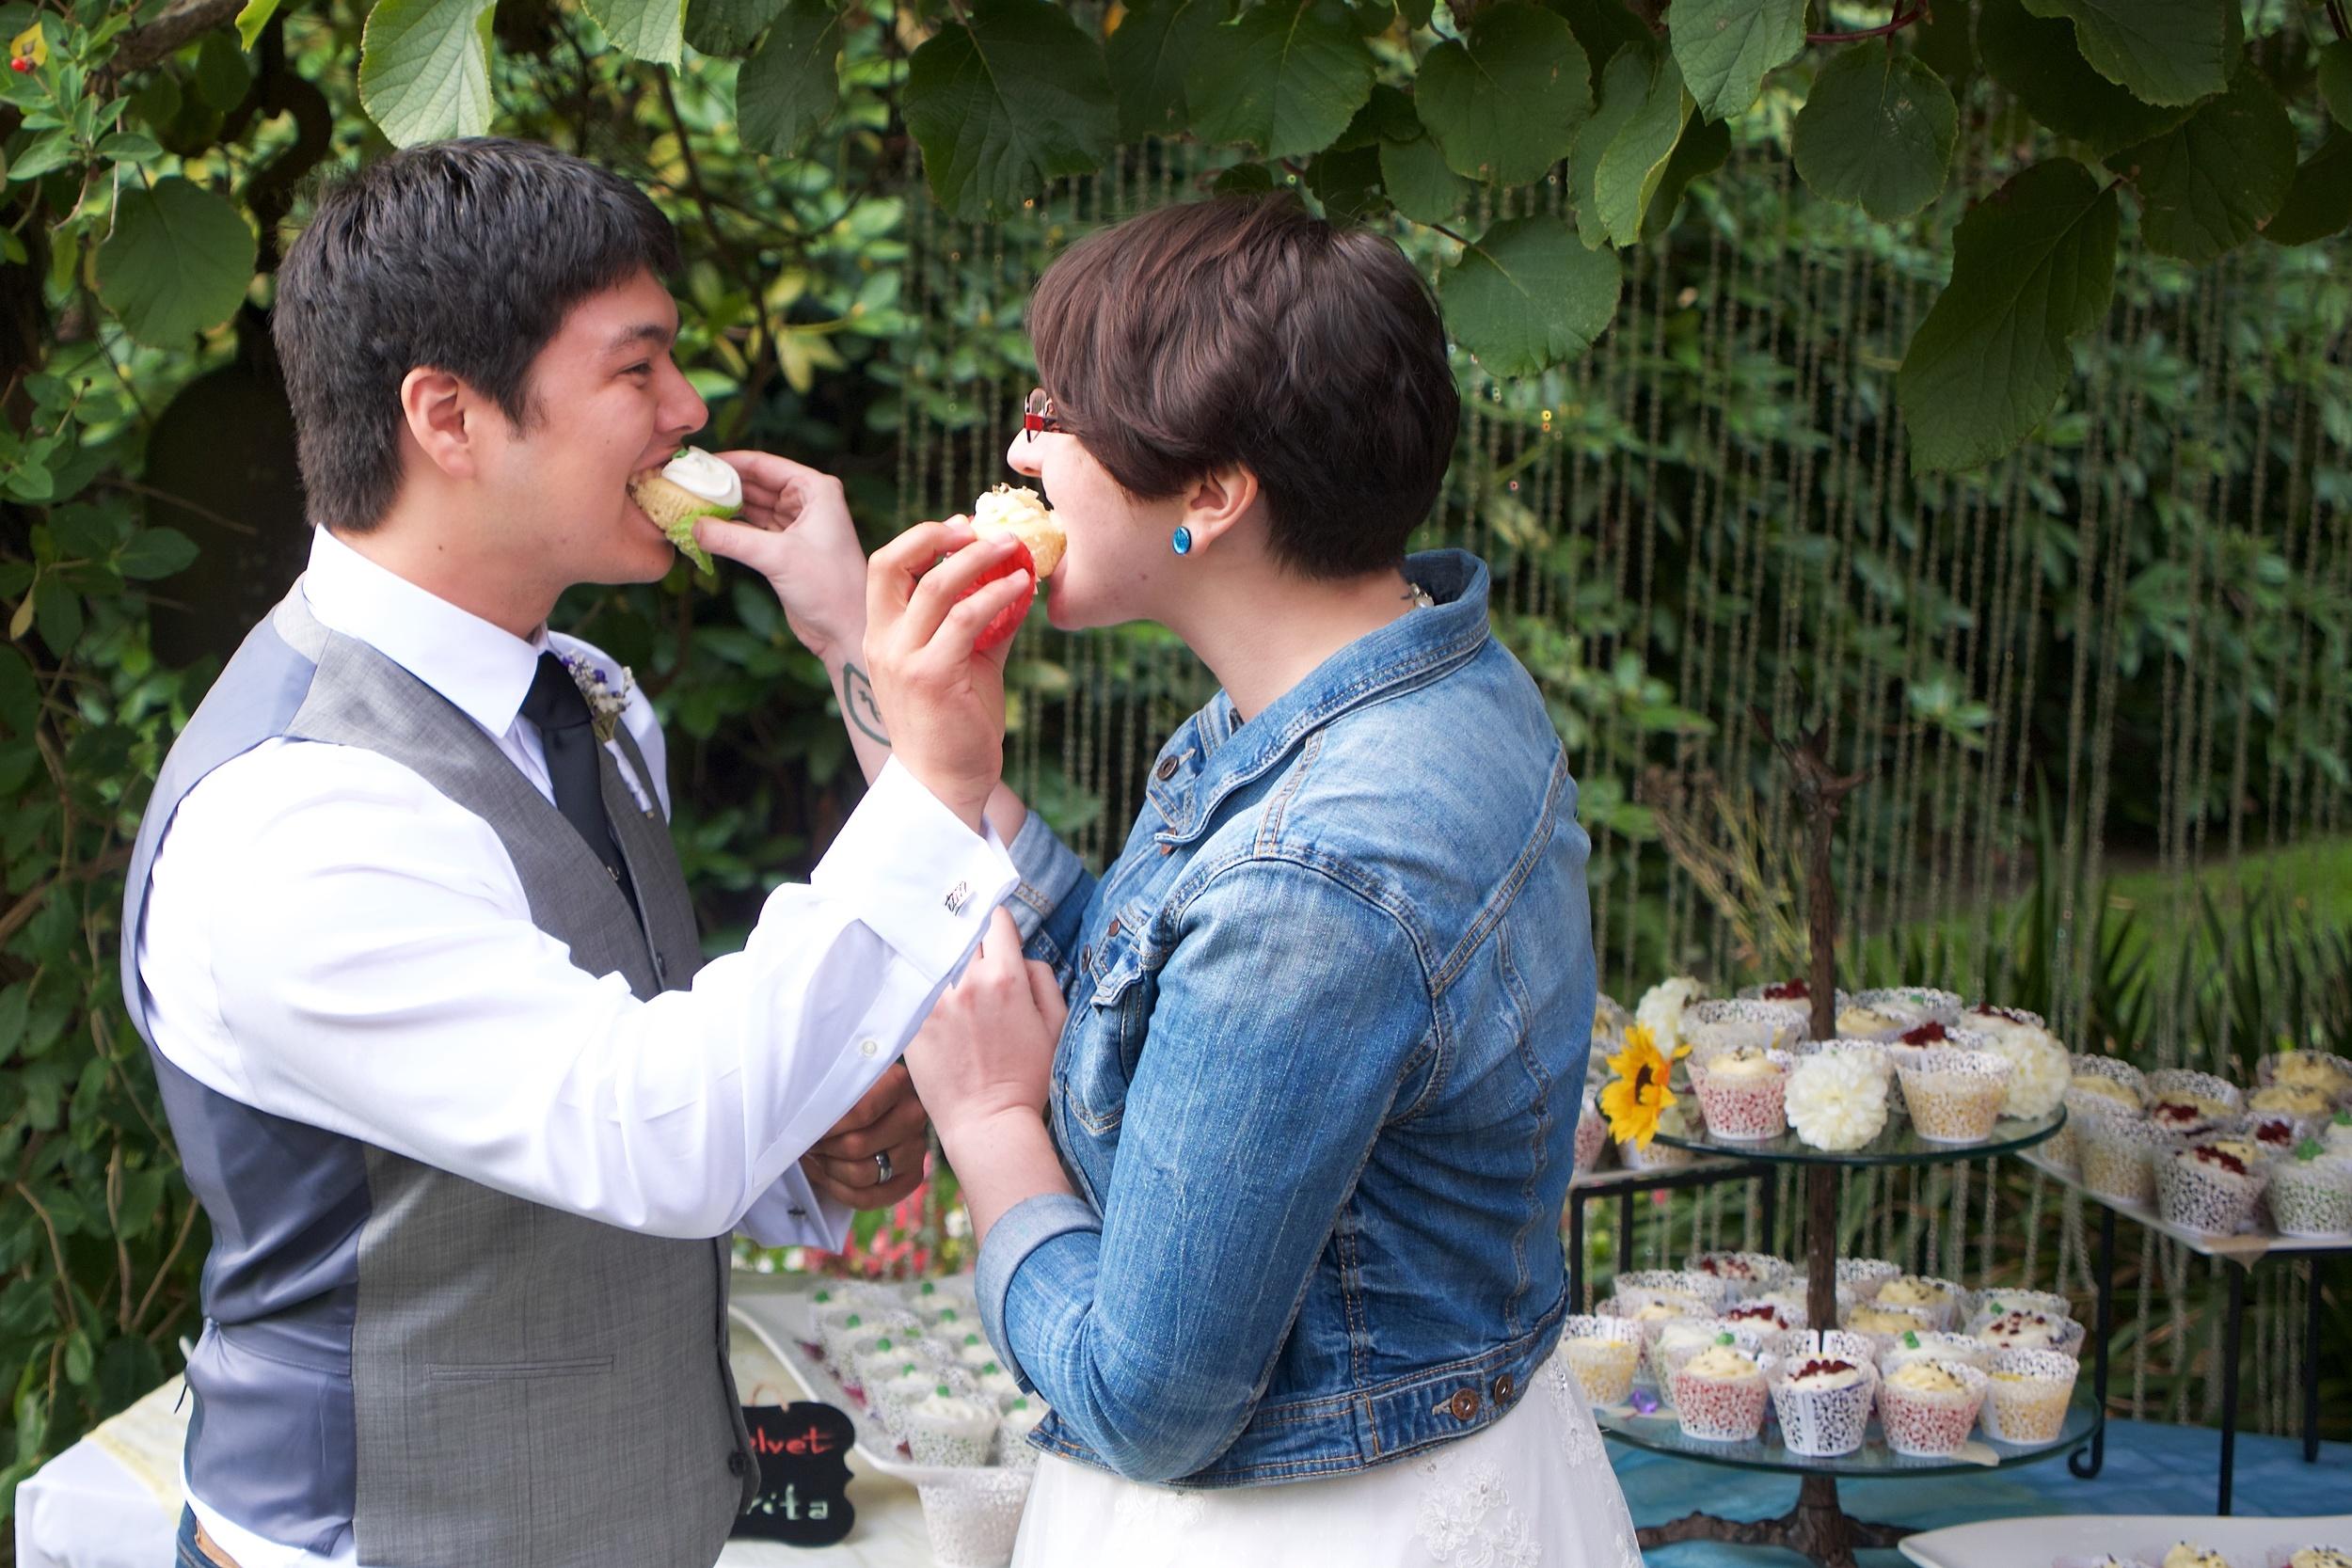 Exchanging cupcakes